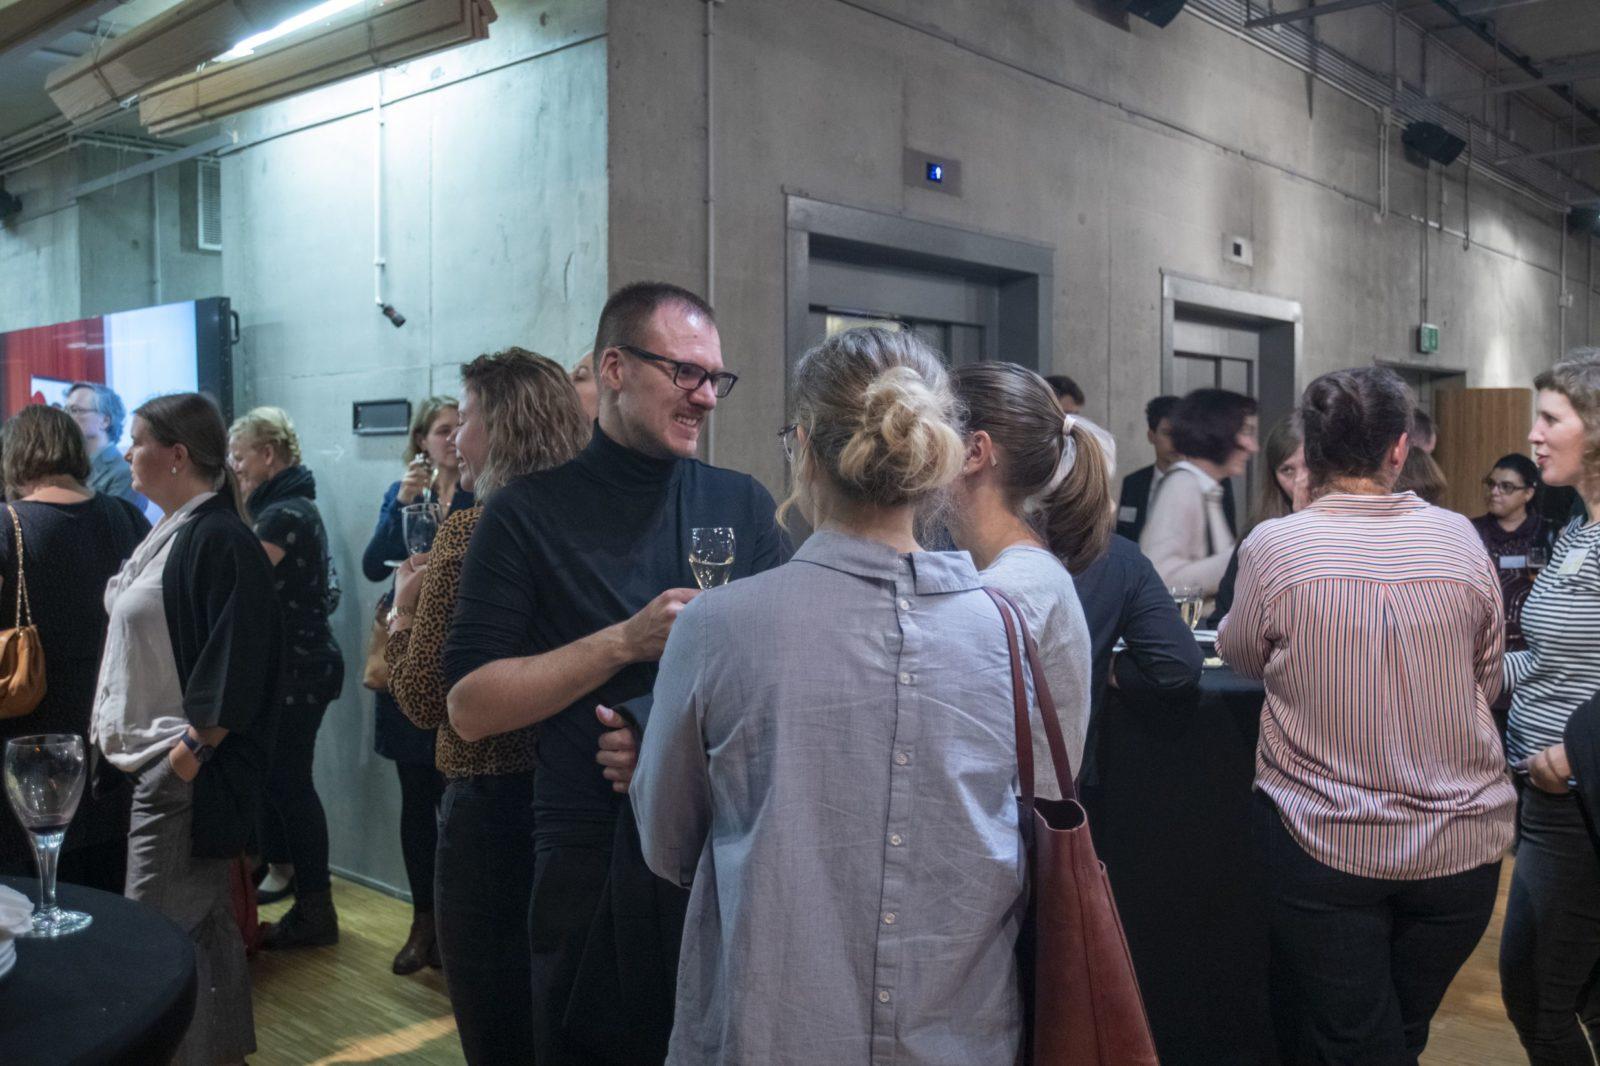 Warschau_2019_Empfang_reception_Thursday_Warsaw_Stasiuk_Konrad_129